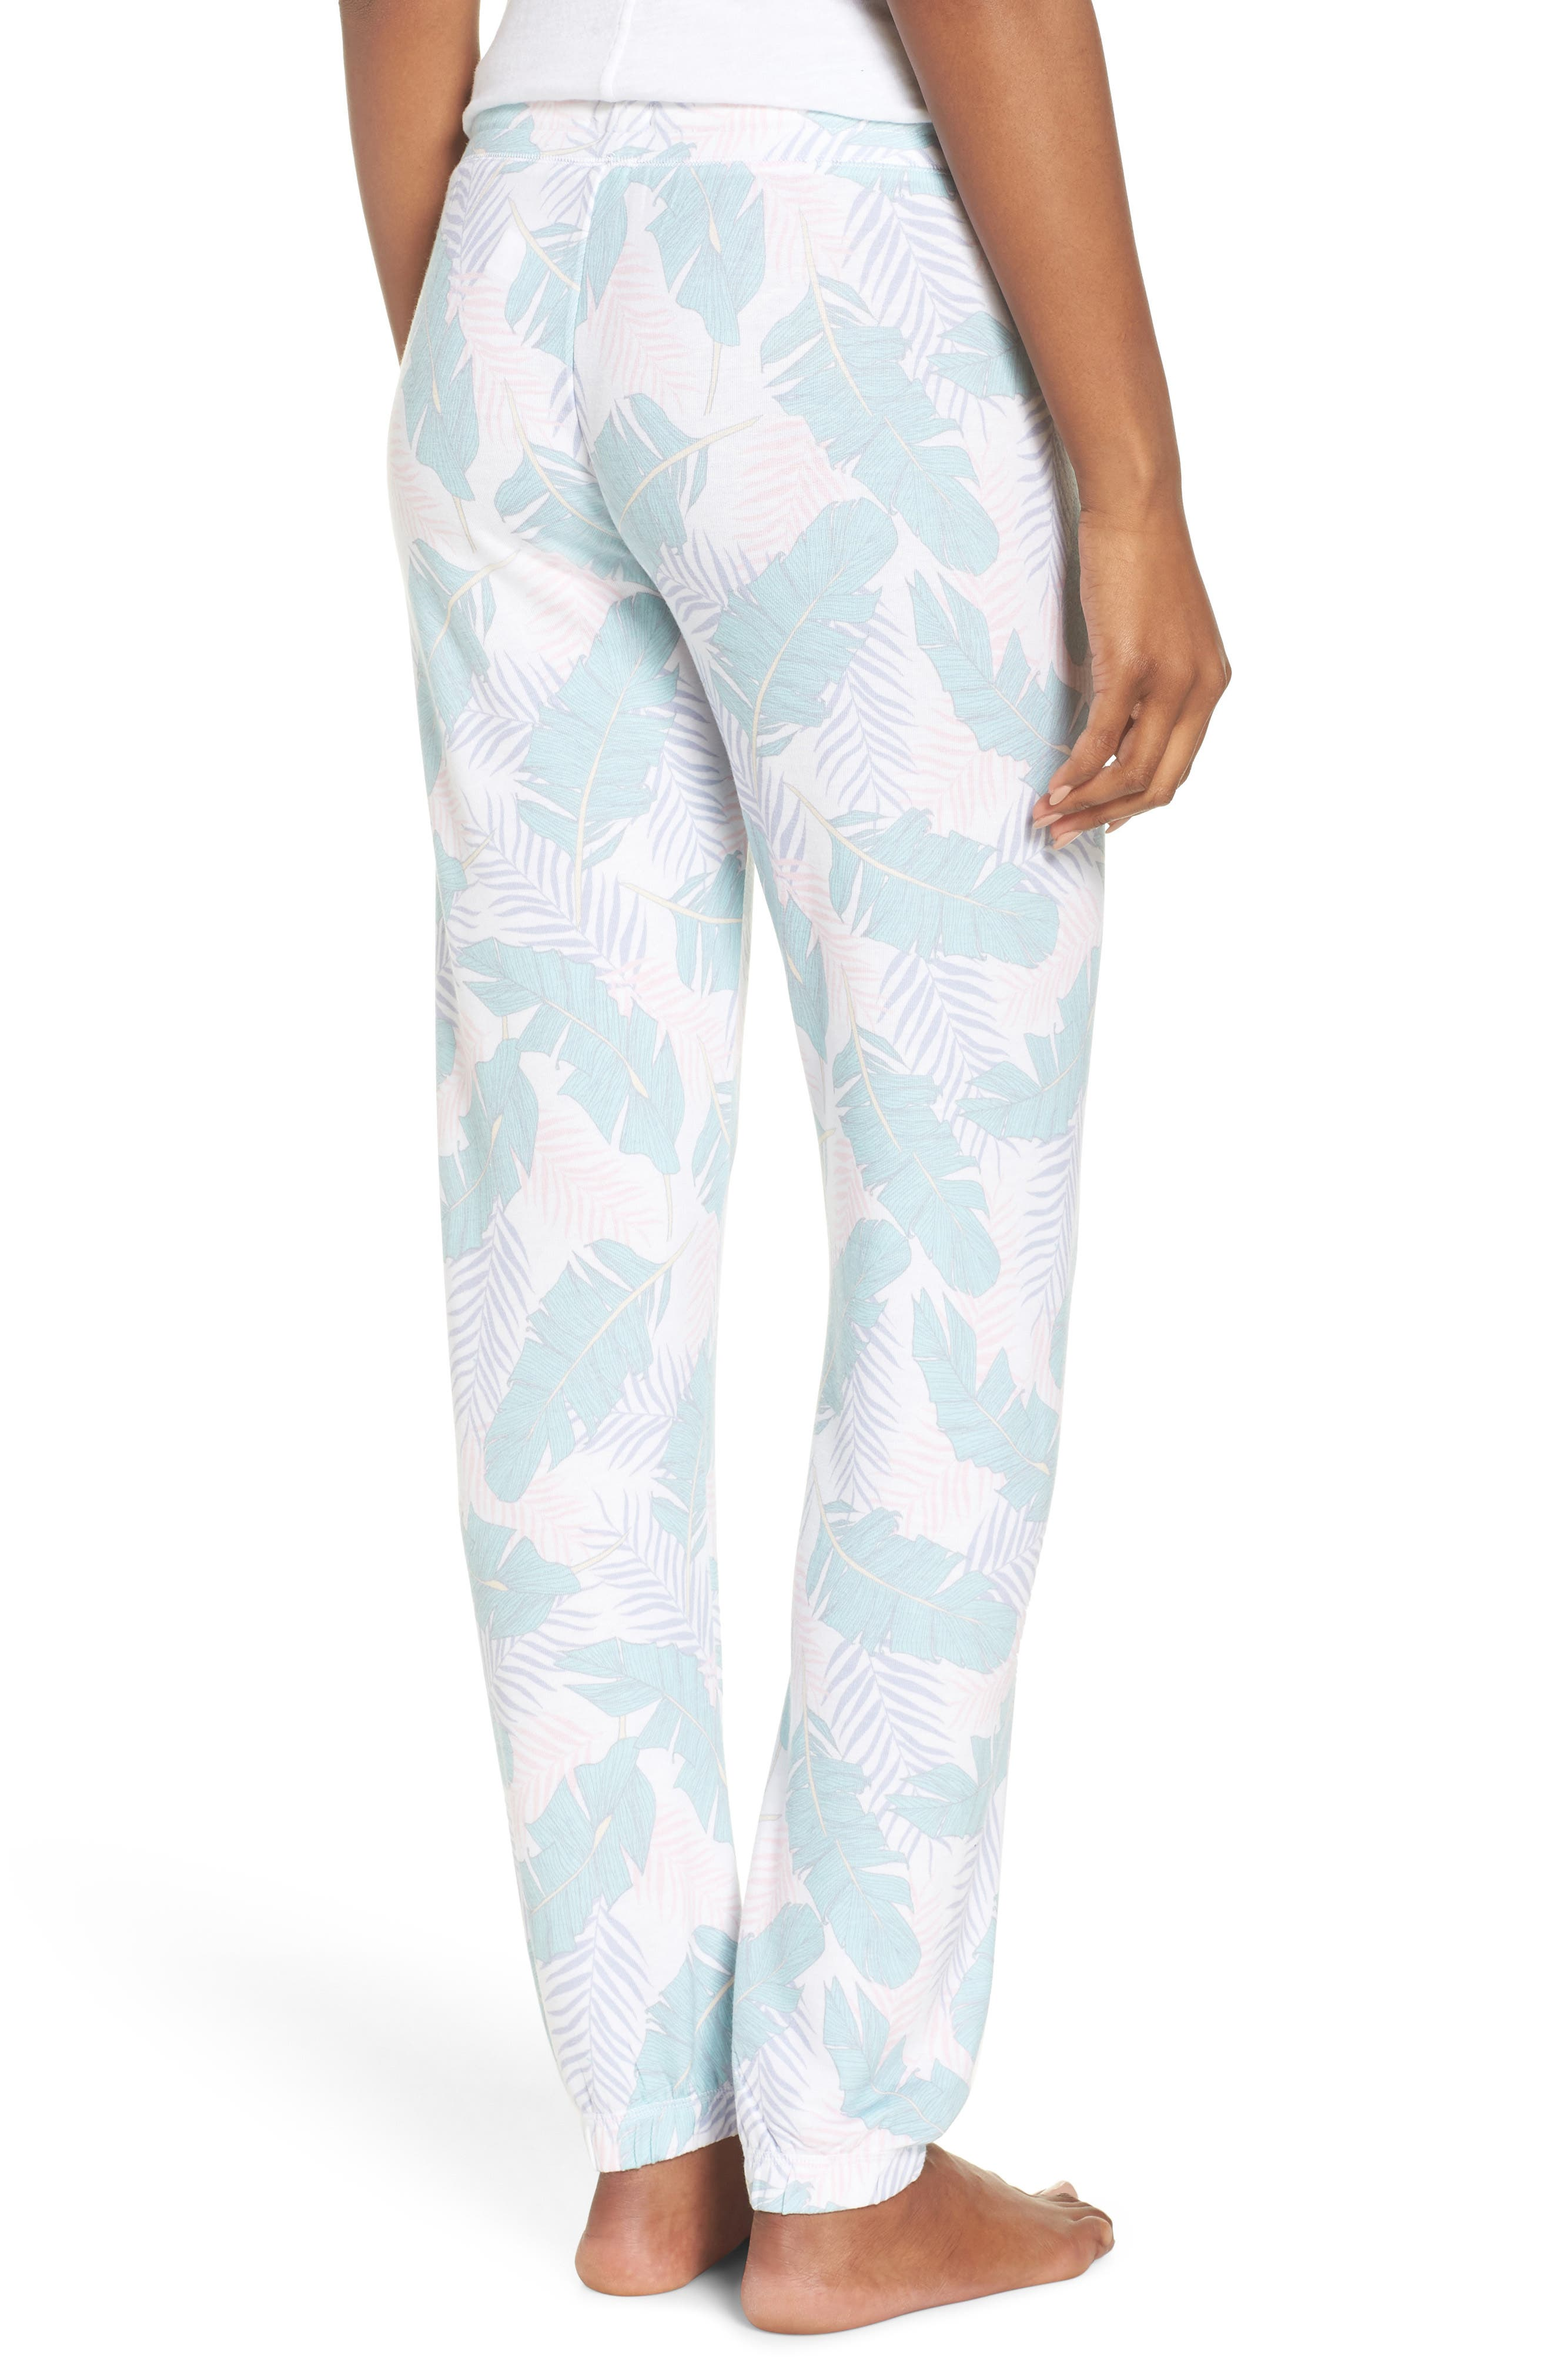 Peachy Jogger Lounge Pants,                             Alternate thumbnail 2, color,                             White